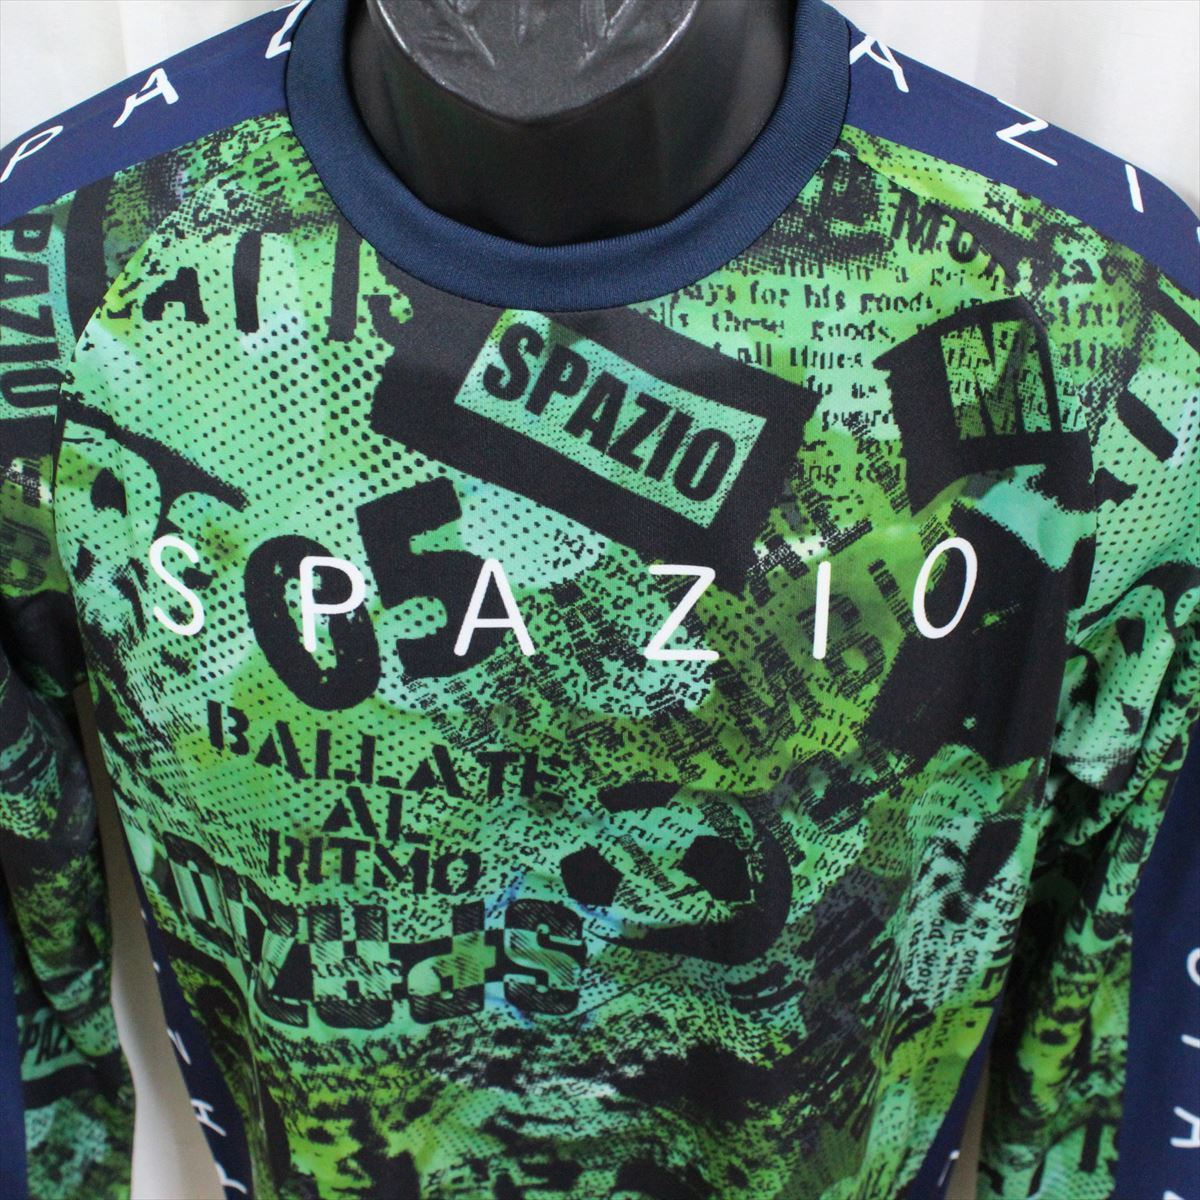 SPAZIO スパッツィオ メンズ長袖シャツ グリーン Oサイズ 新品 フットサル ロングスリーブ 吸水速乾 UVケア_画像2